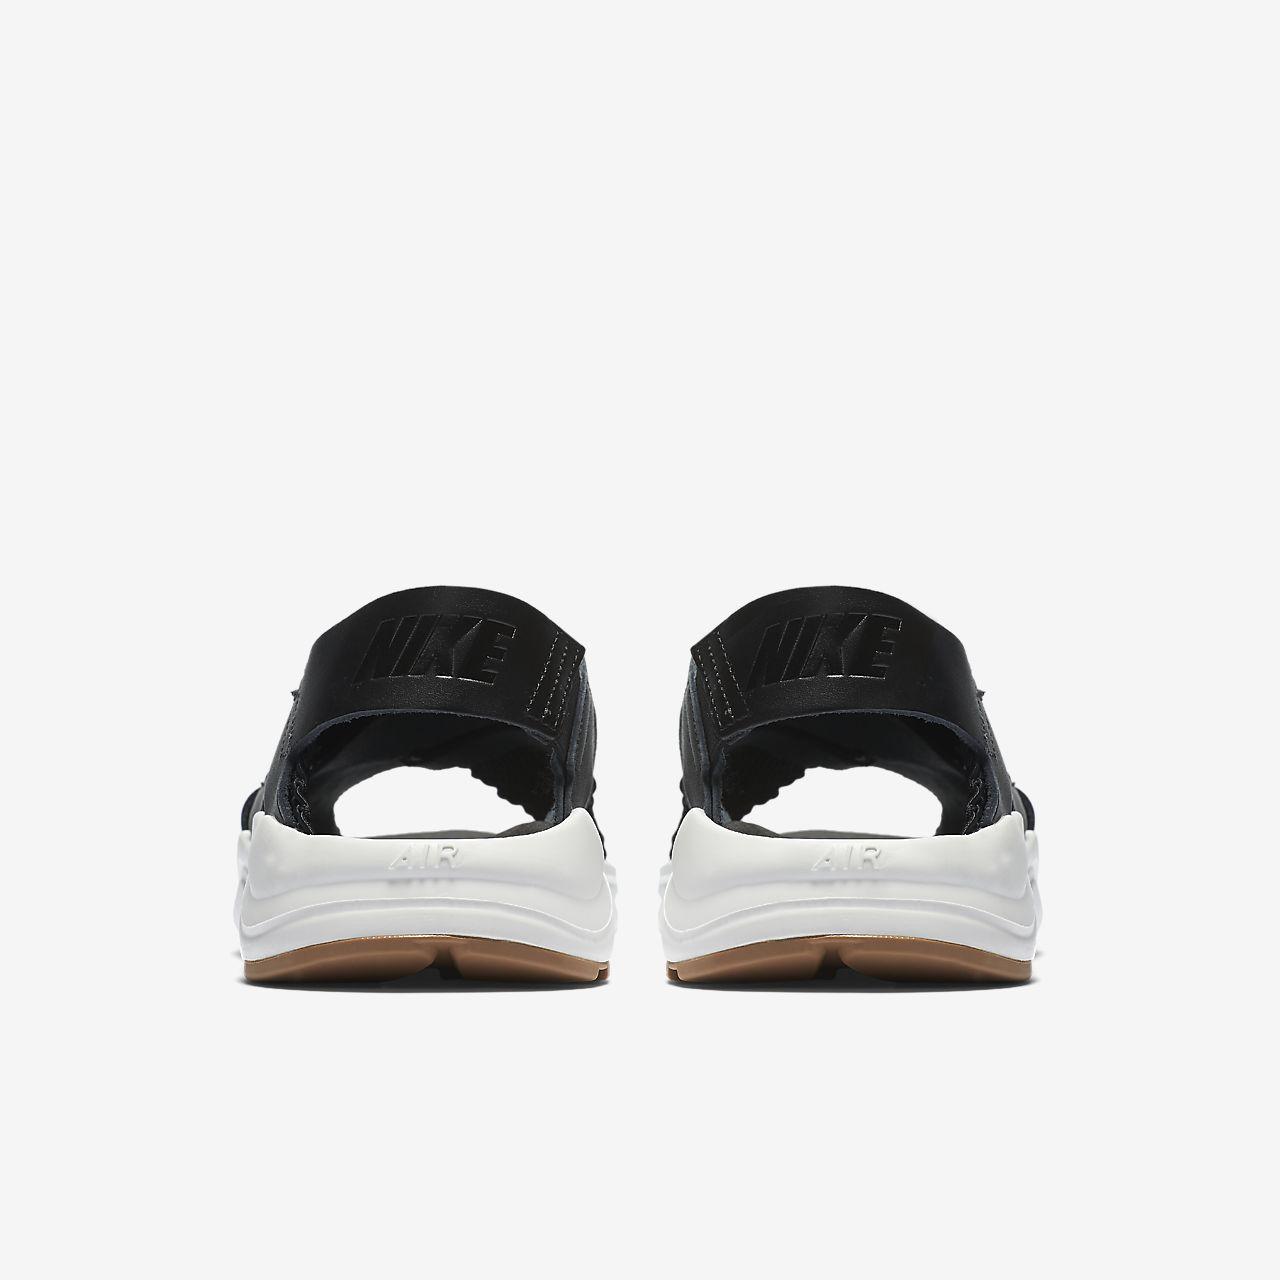 8330238211d7 Nike Air Huarache Ultra Women s Sandal. Nike.com MY